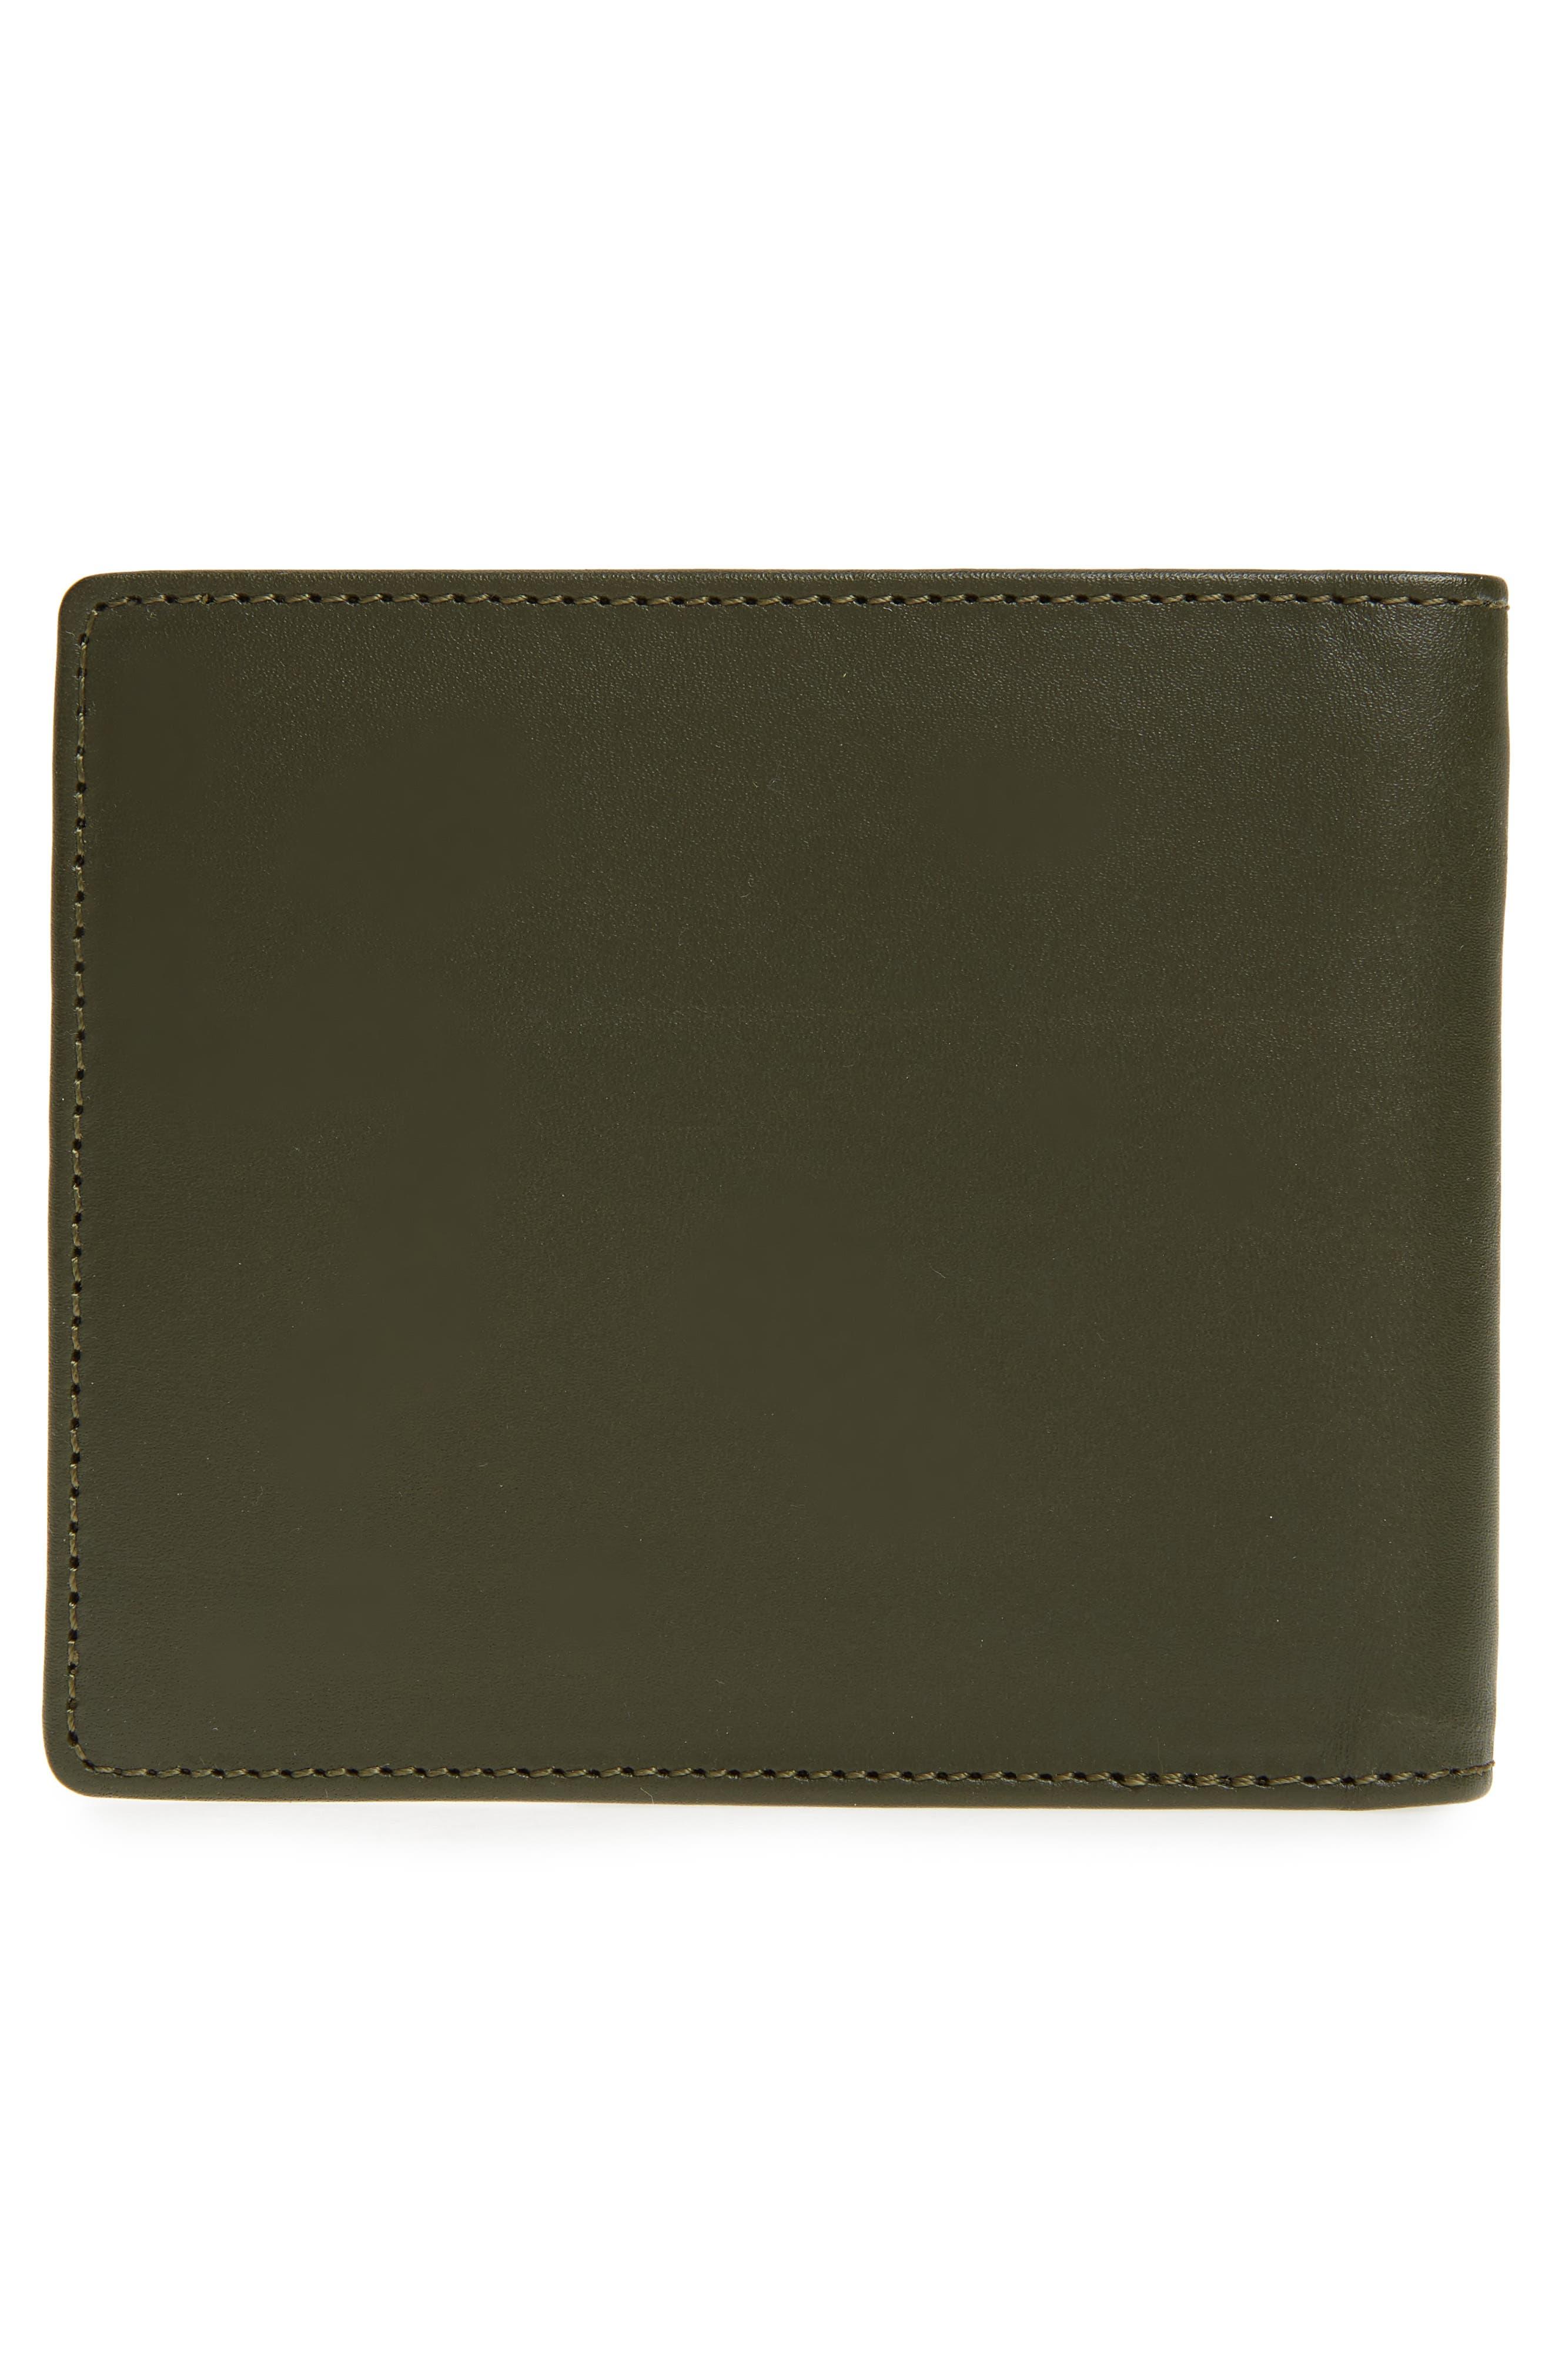 Aly Bifold Leather Wallet,                             Alternate thumbnail 3, color,                             Khaki